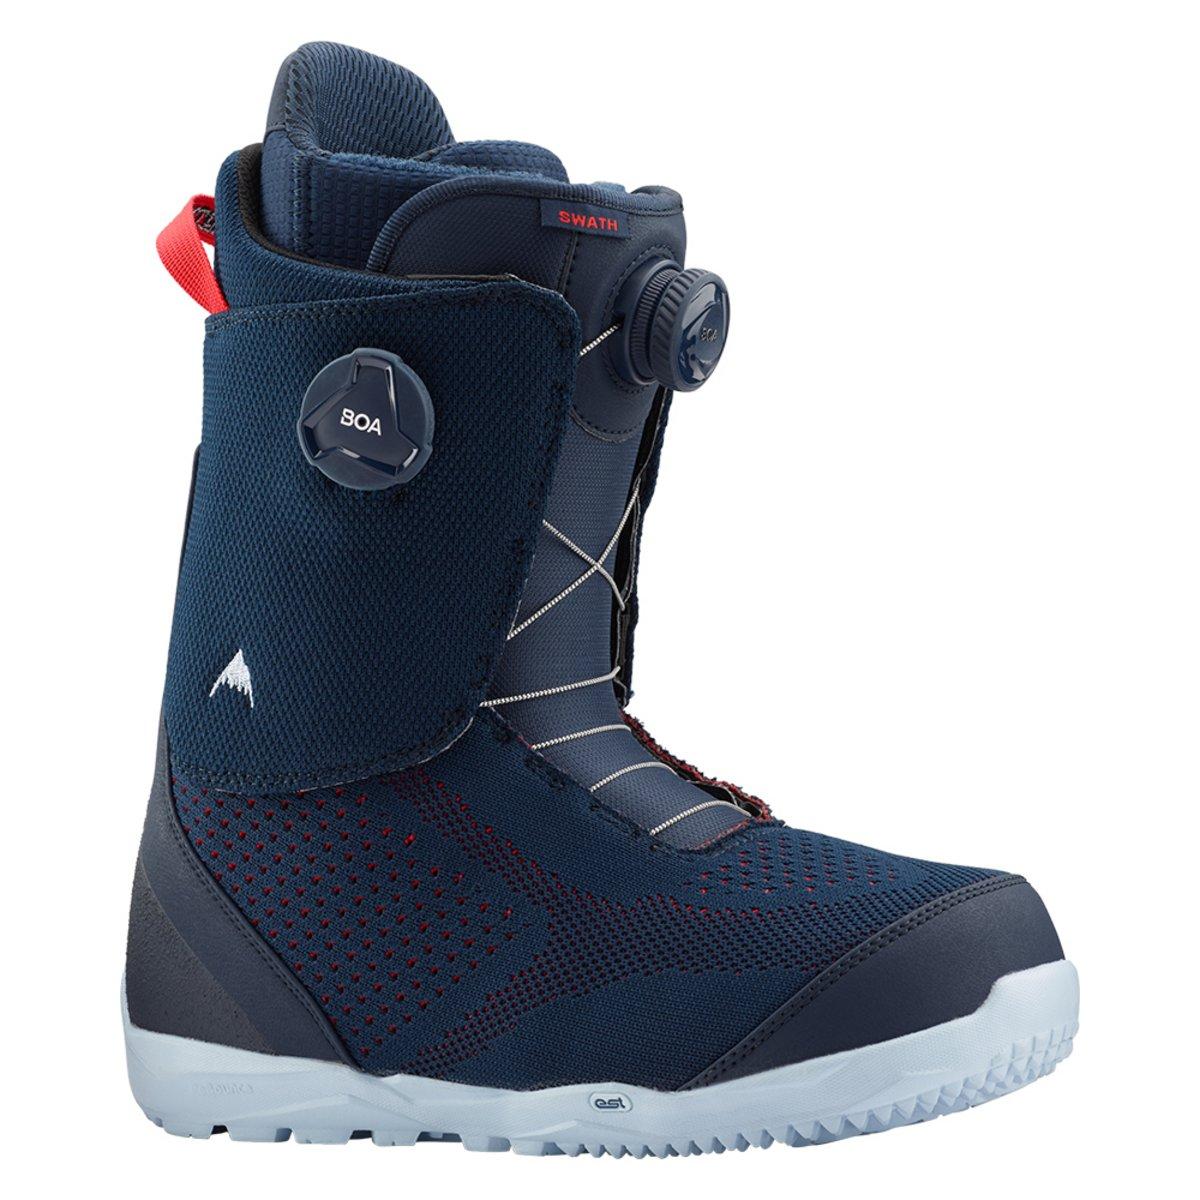 Burton Men's Swath Double Boa Snowboard Boots 2019 / 2020 0